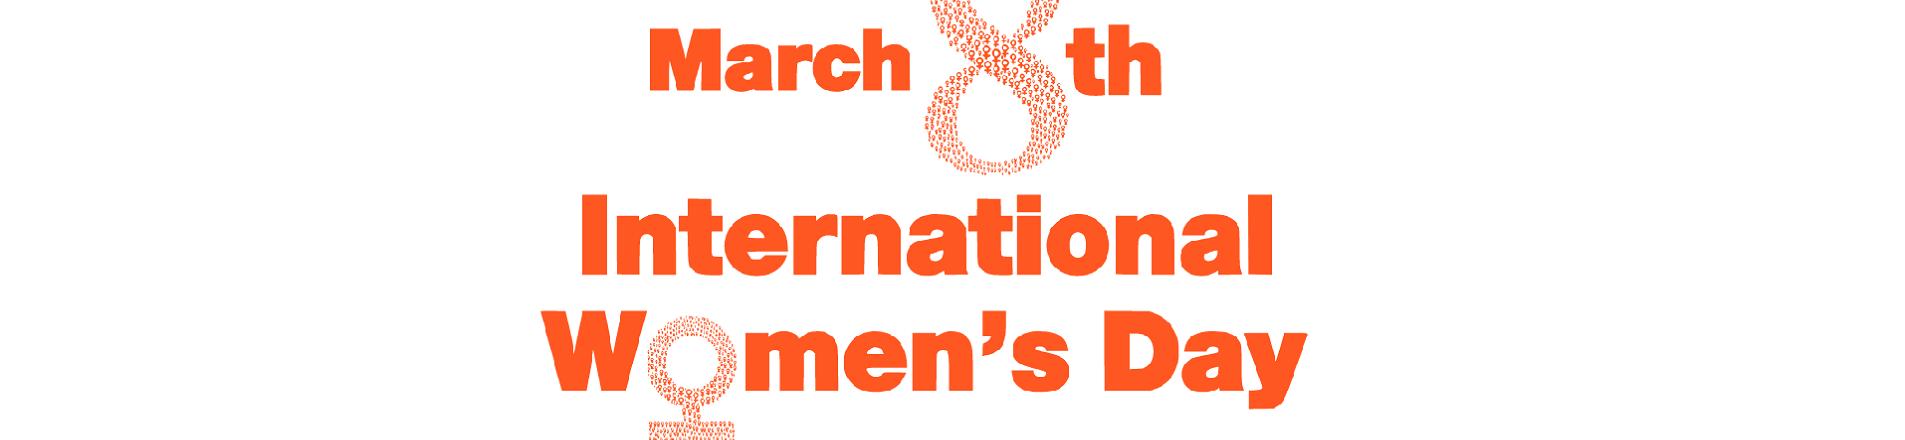 PwC: International Women's Day 2016